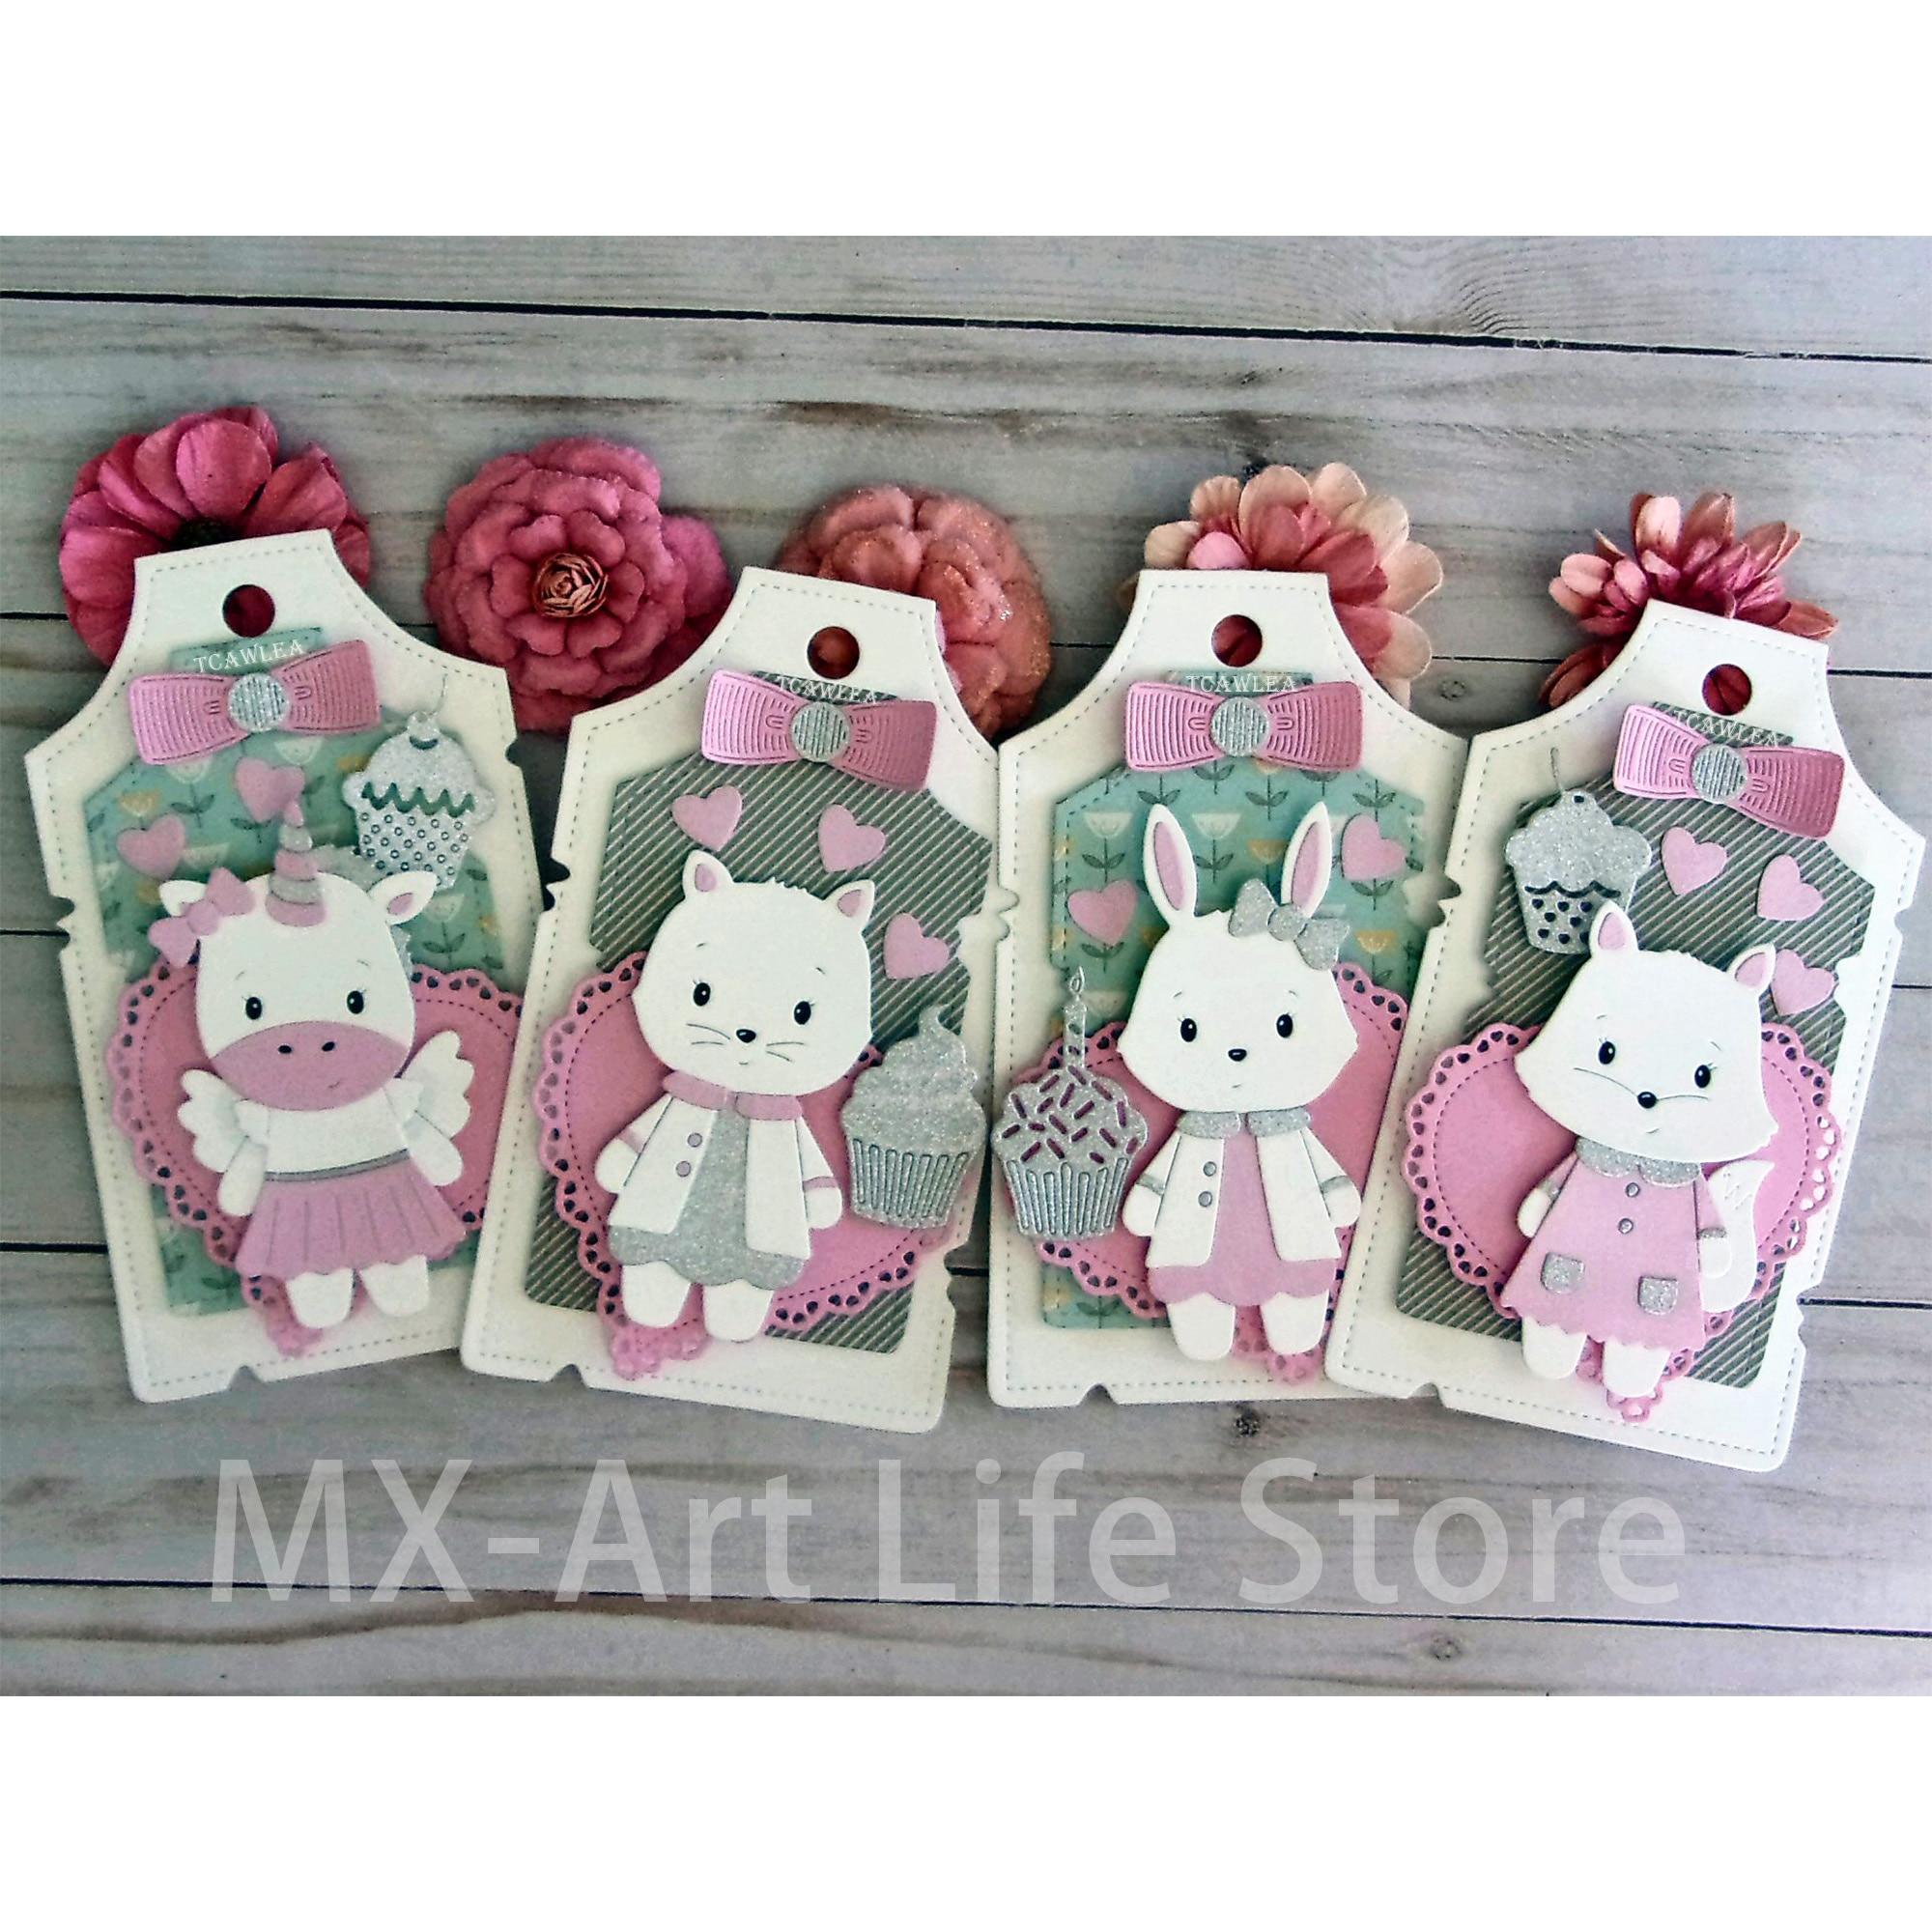 Lovely Unicorn Rabbit Fox Cat Bear Metal Cutting Die Animal Doll DIY Scrapbooking Paper Cards Decorative Craft Embossing